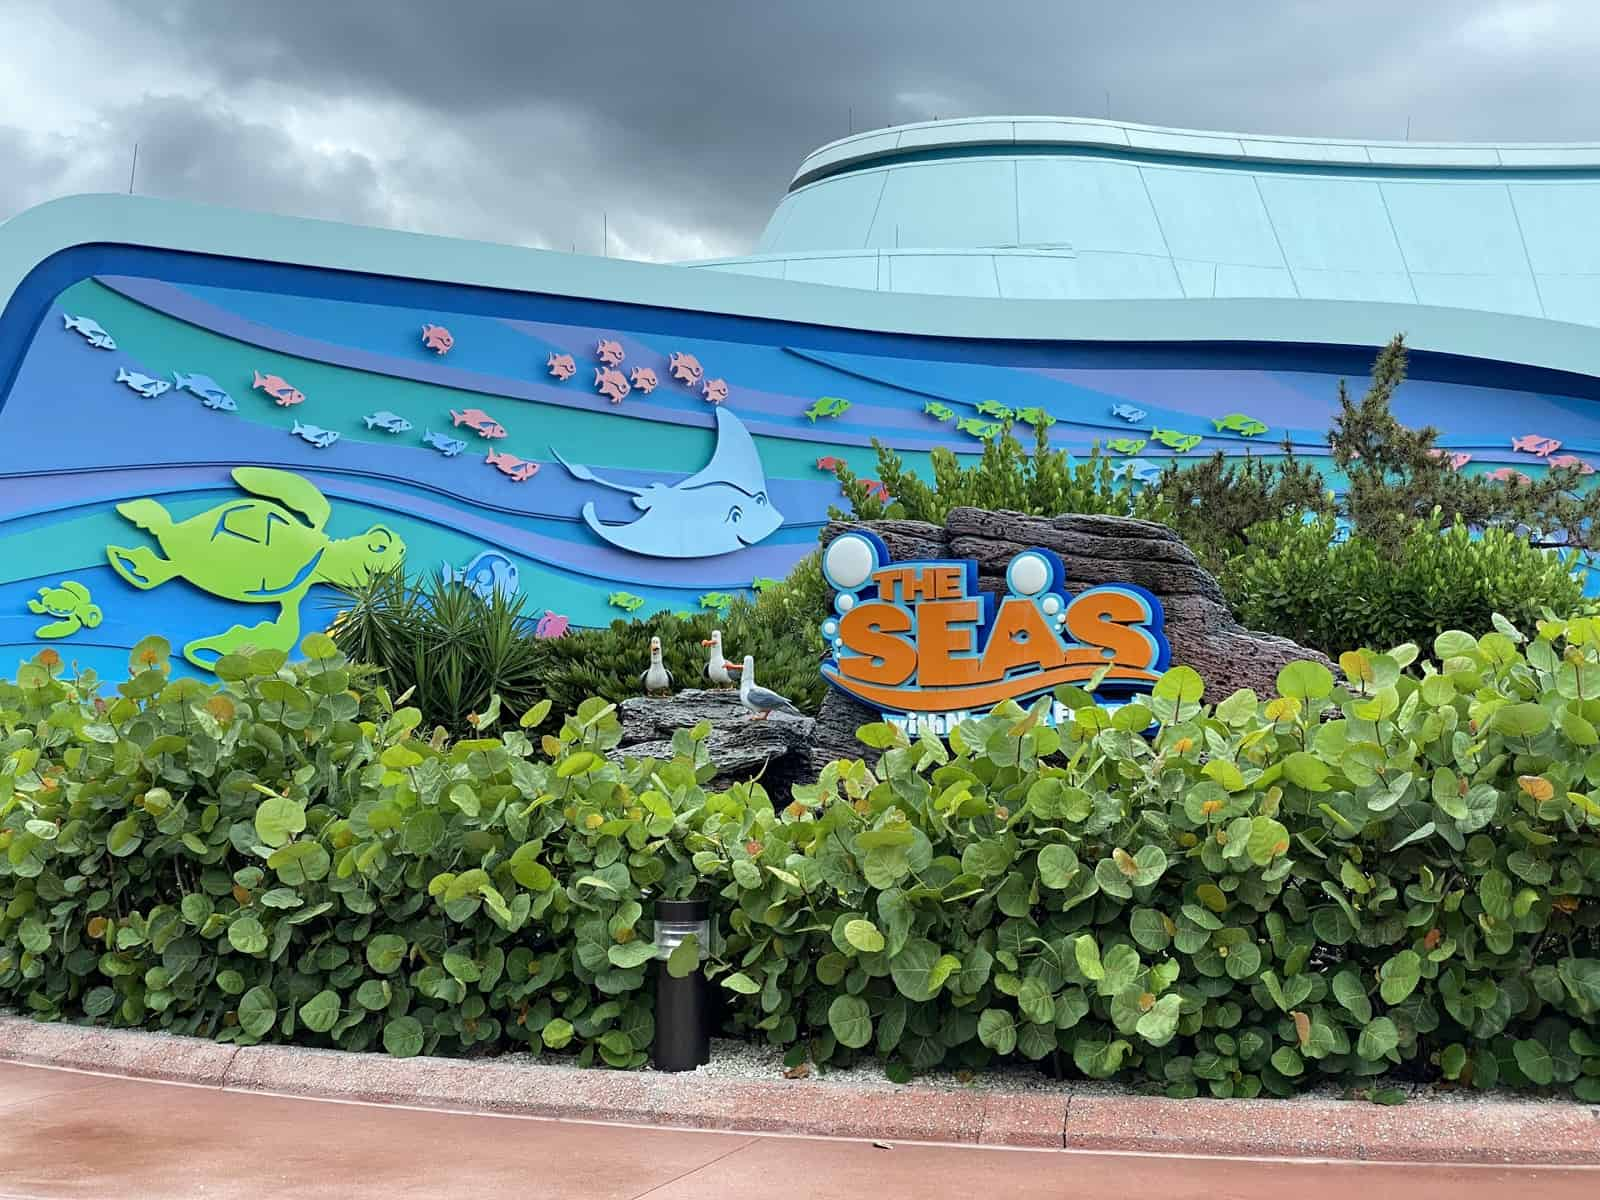 The Seas Pavilion at Epcot